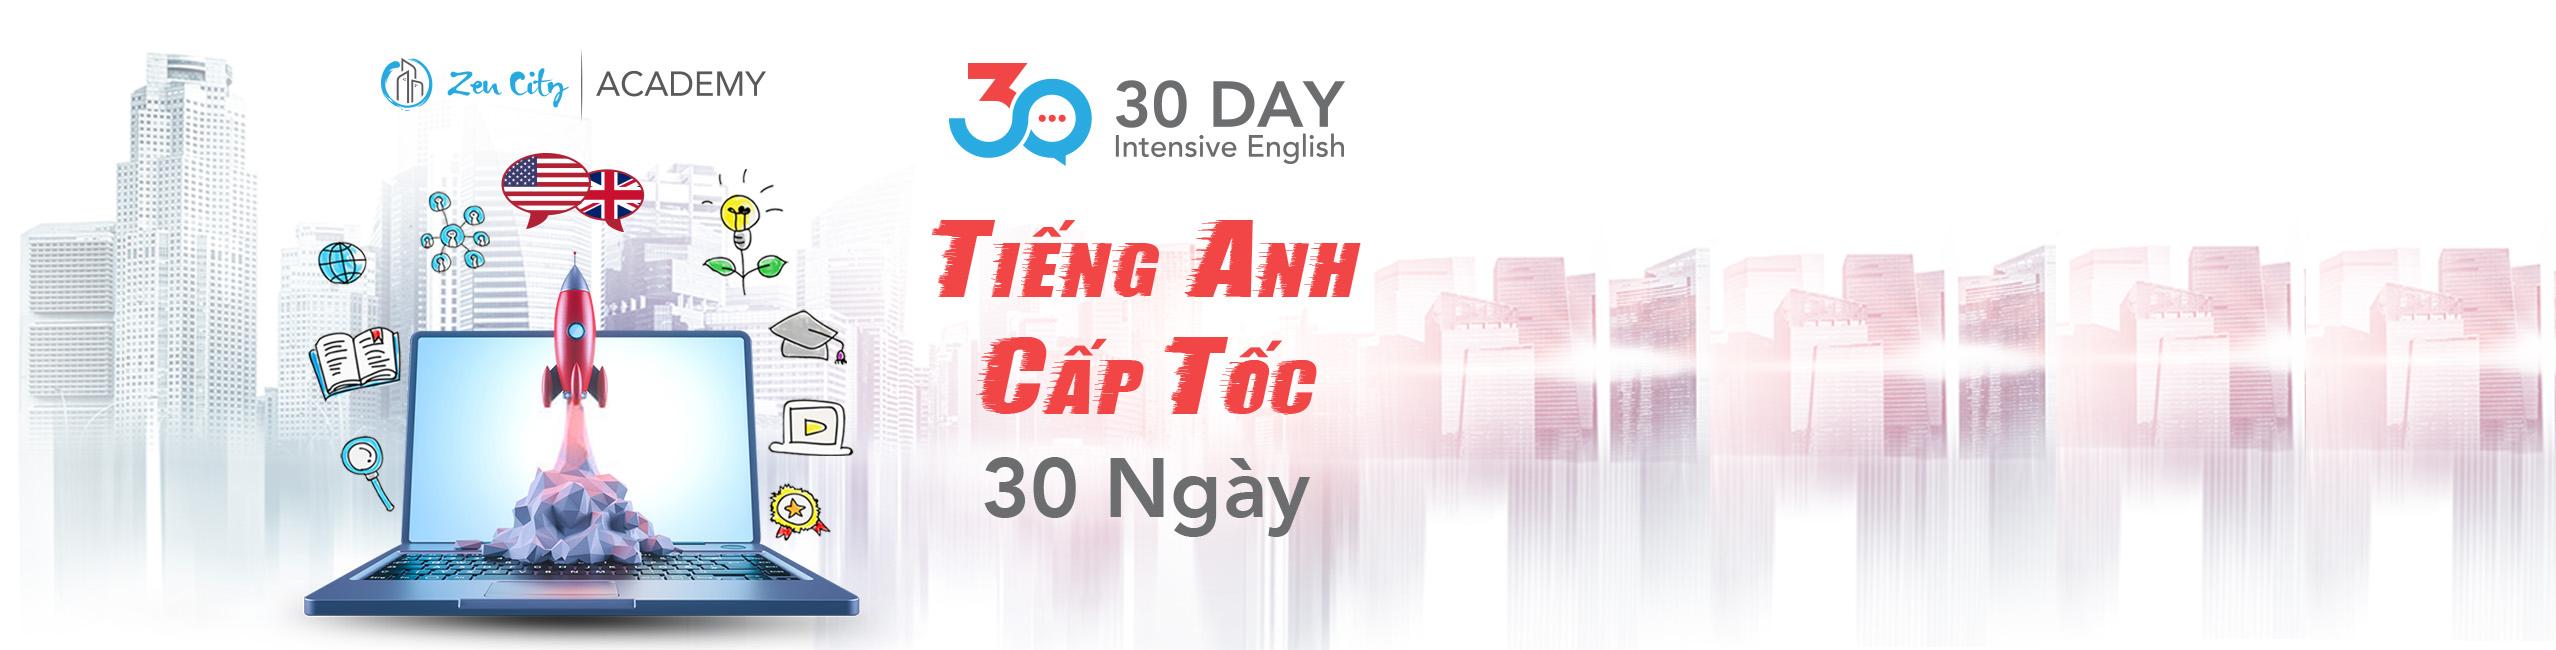 30 Days Intensive